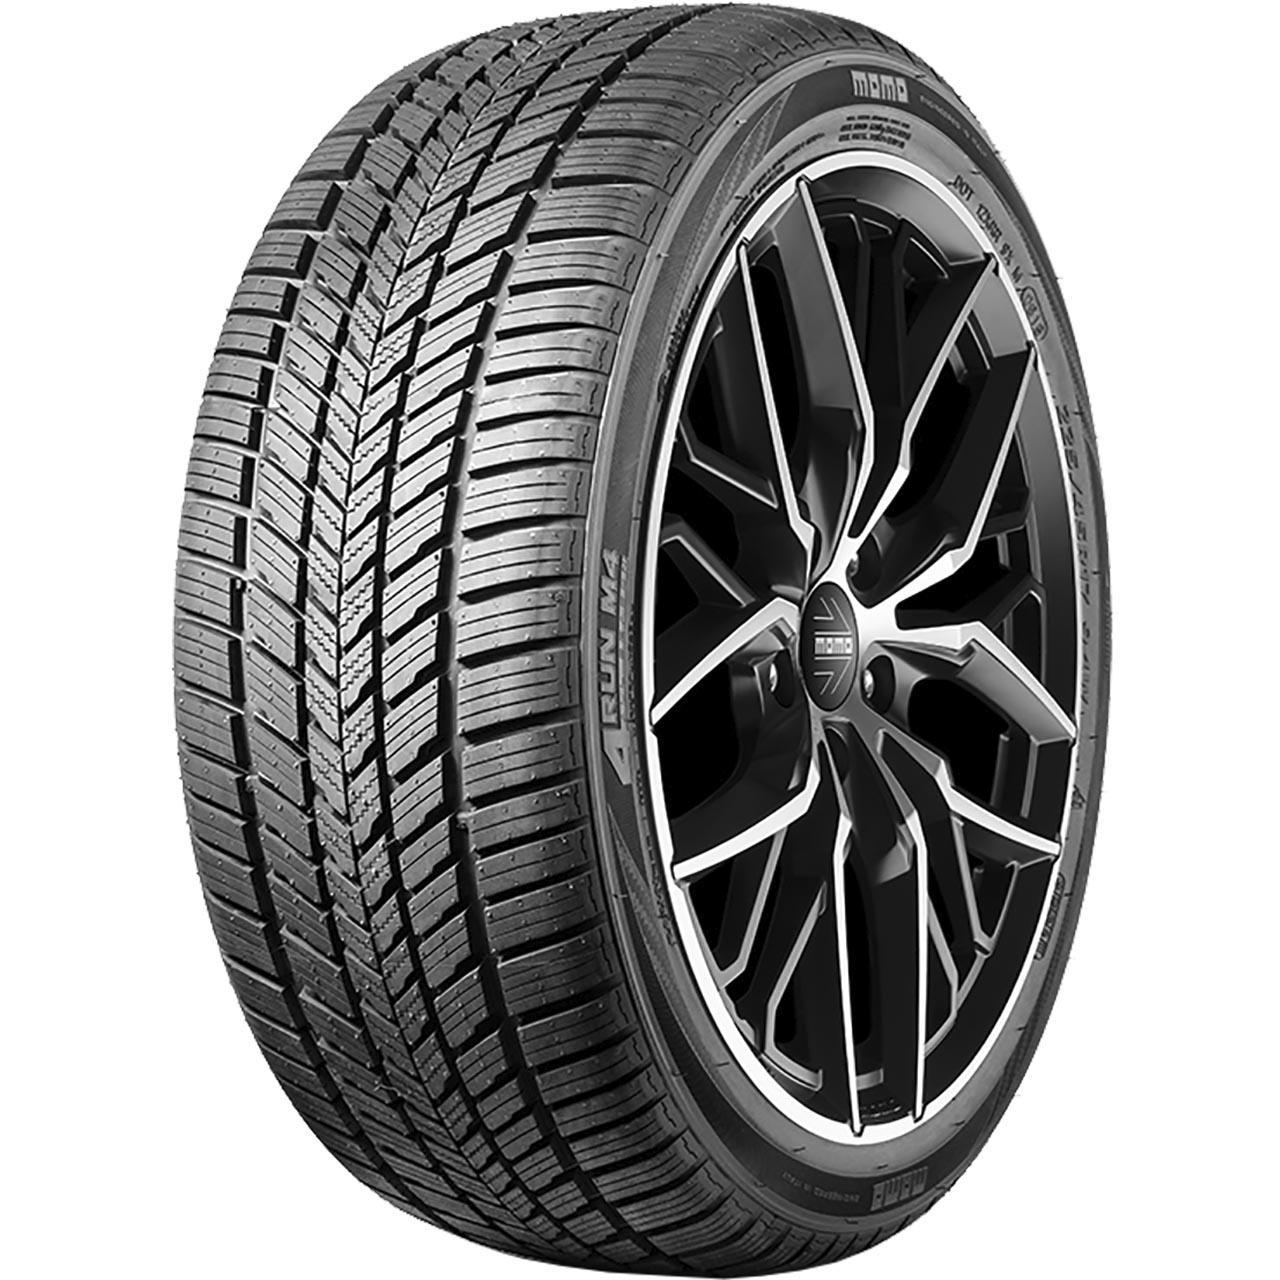 Momo Tire M 4 Four Season 195/65R15 91H